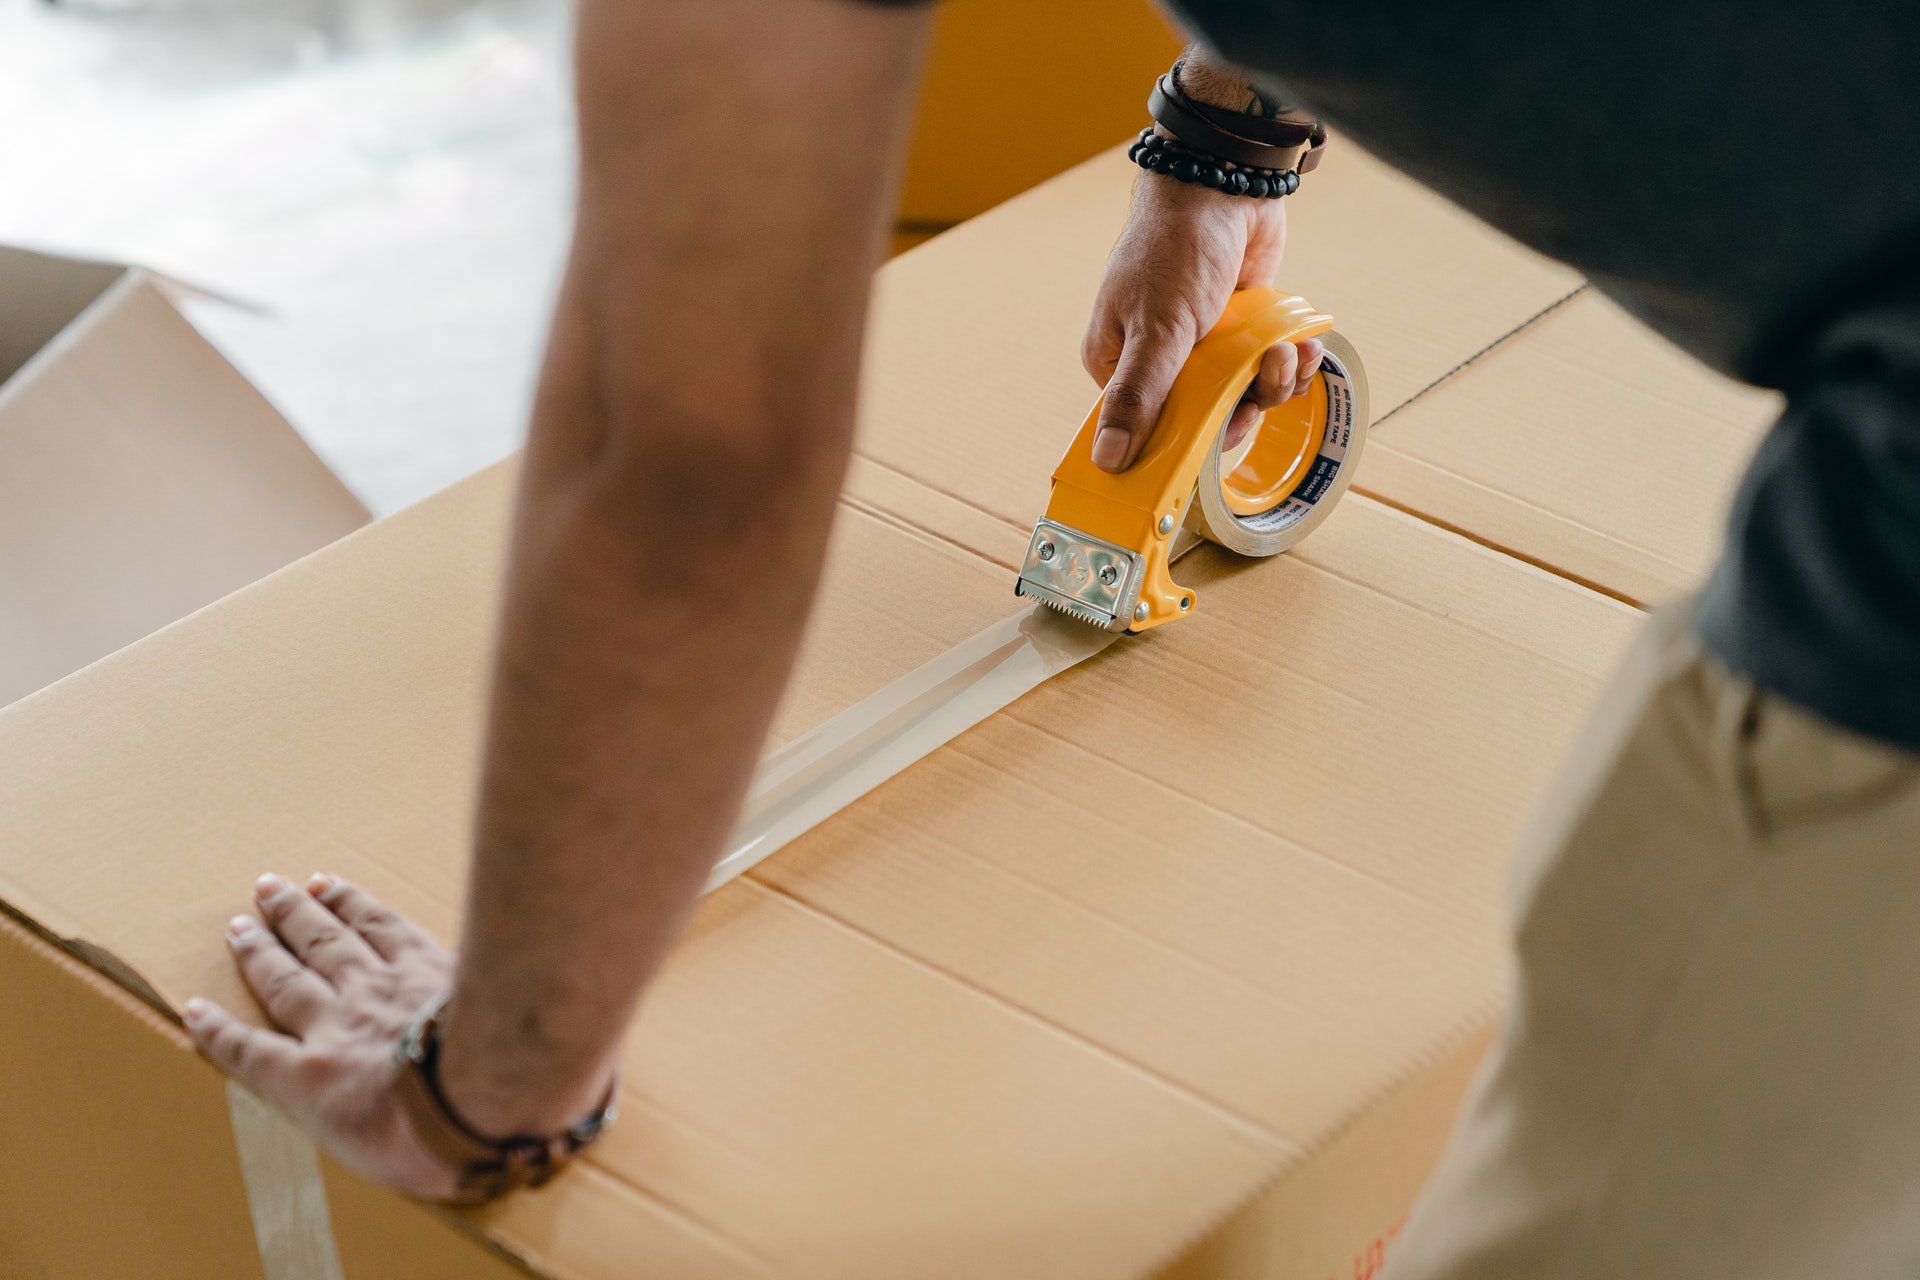 Reinvención: Tips para un dueño de empresa de mudanza